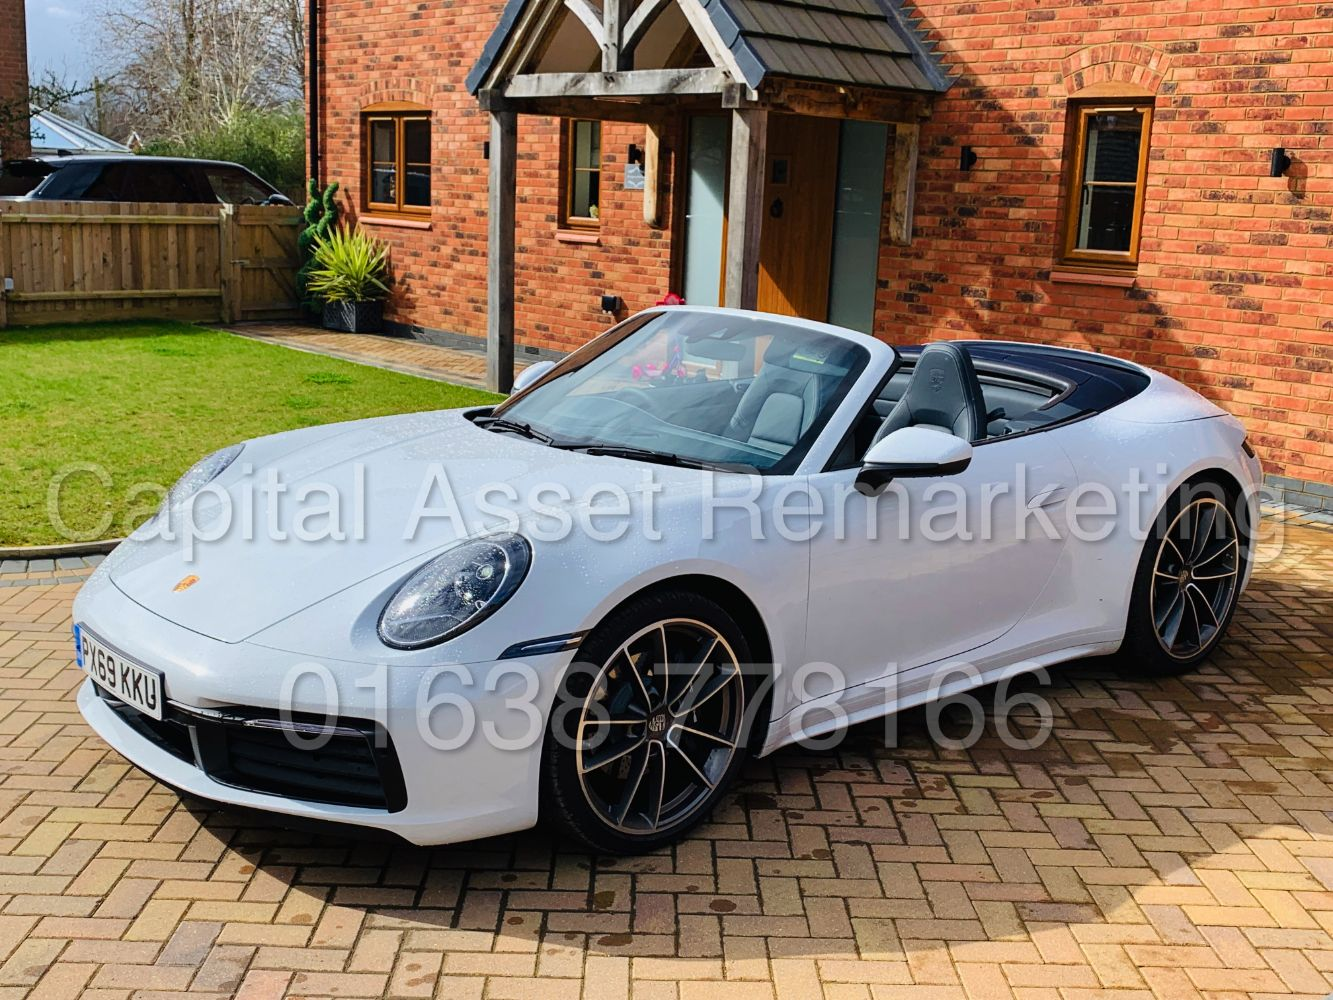 2020 Porsche 911*992 Cabriolet* (Huge Spec) - 2019 Mercedes-Benz C200 *AMG* Cabriolet + More: Cars, Commercials & 4x4's  (REGISTER NOW FOR FREE)